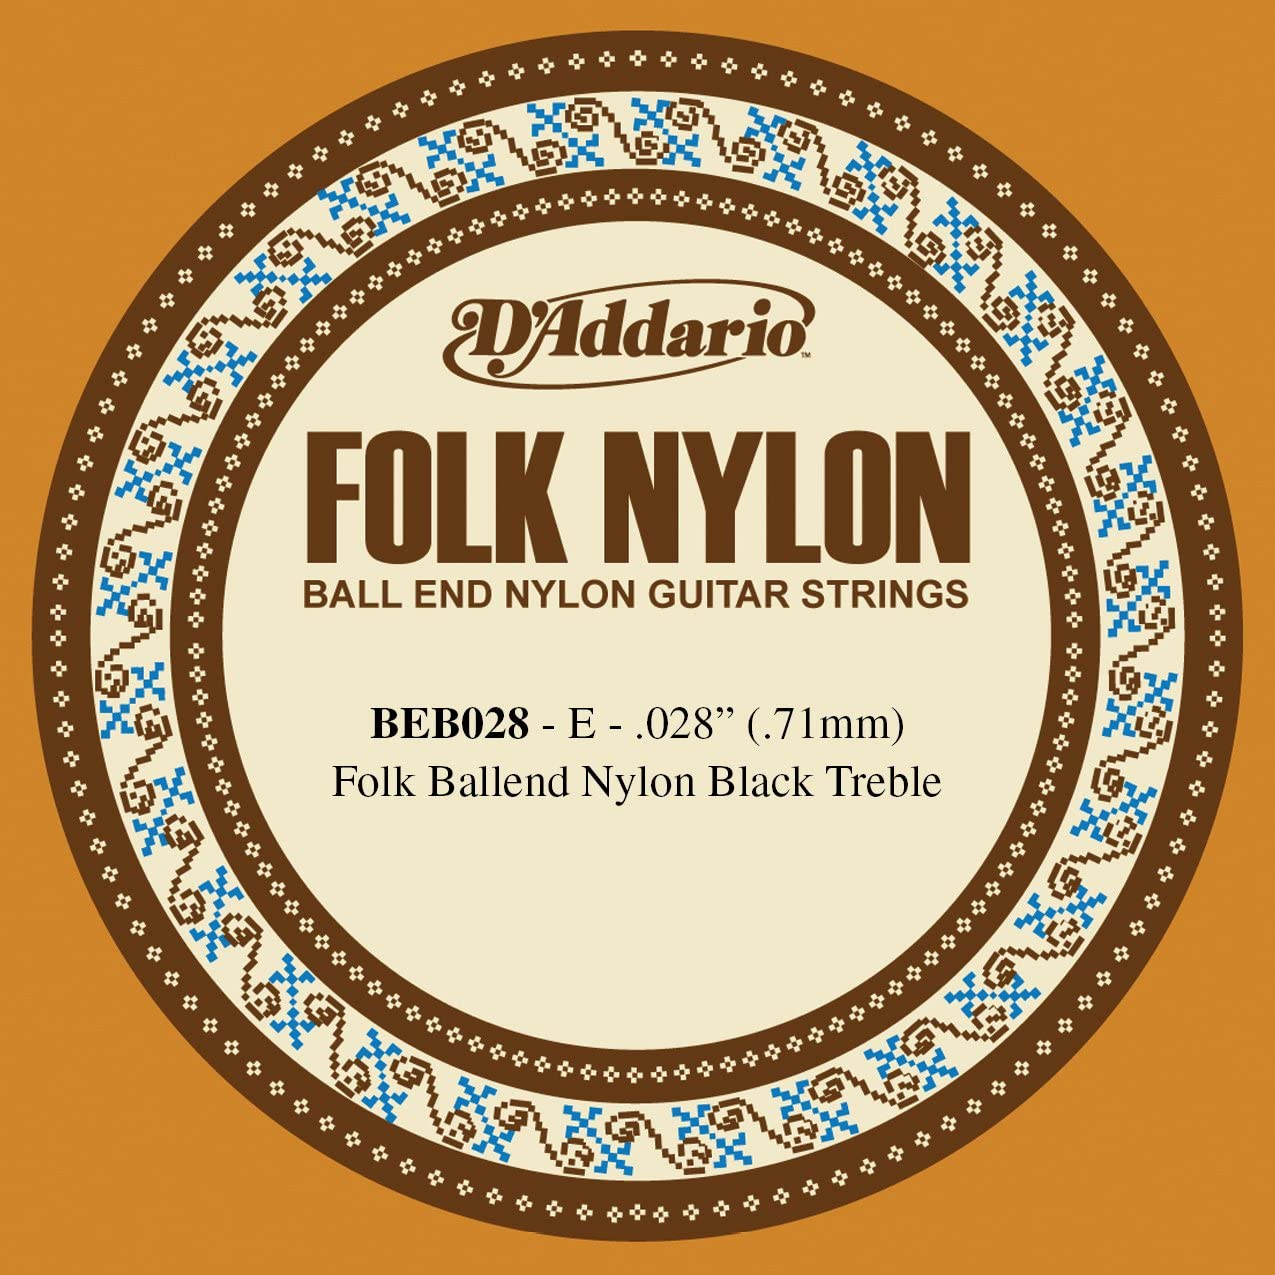 D'Addario BEB028 Folk Nylon, cuerda individual para guitarra, nailon negro, extremo de bola.028